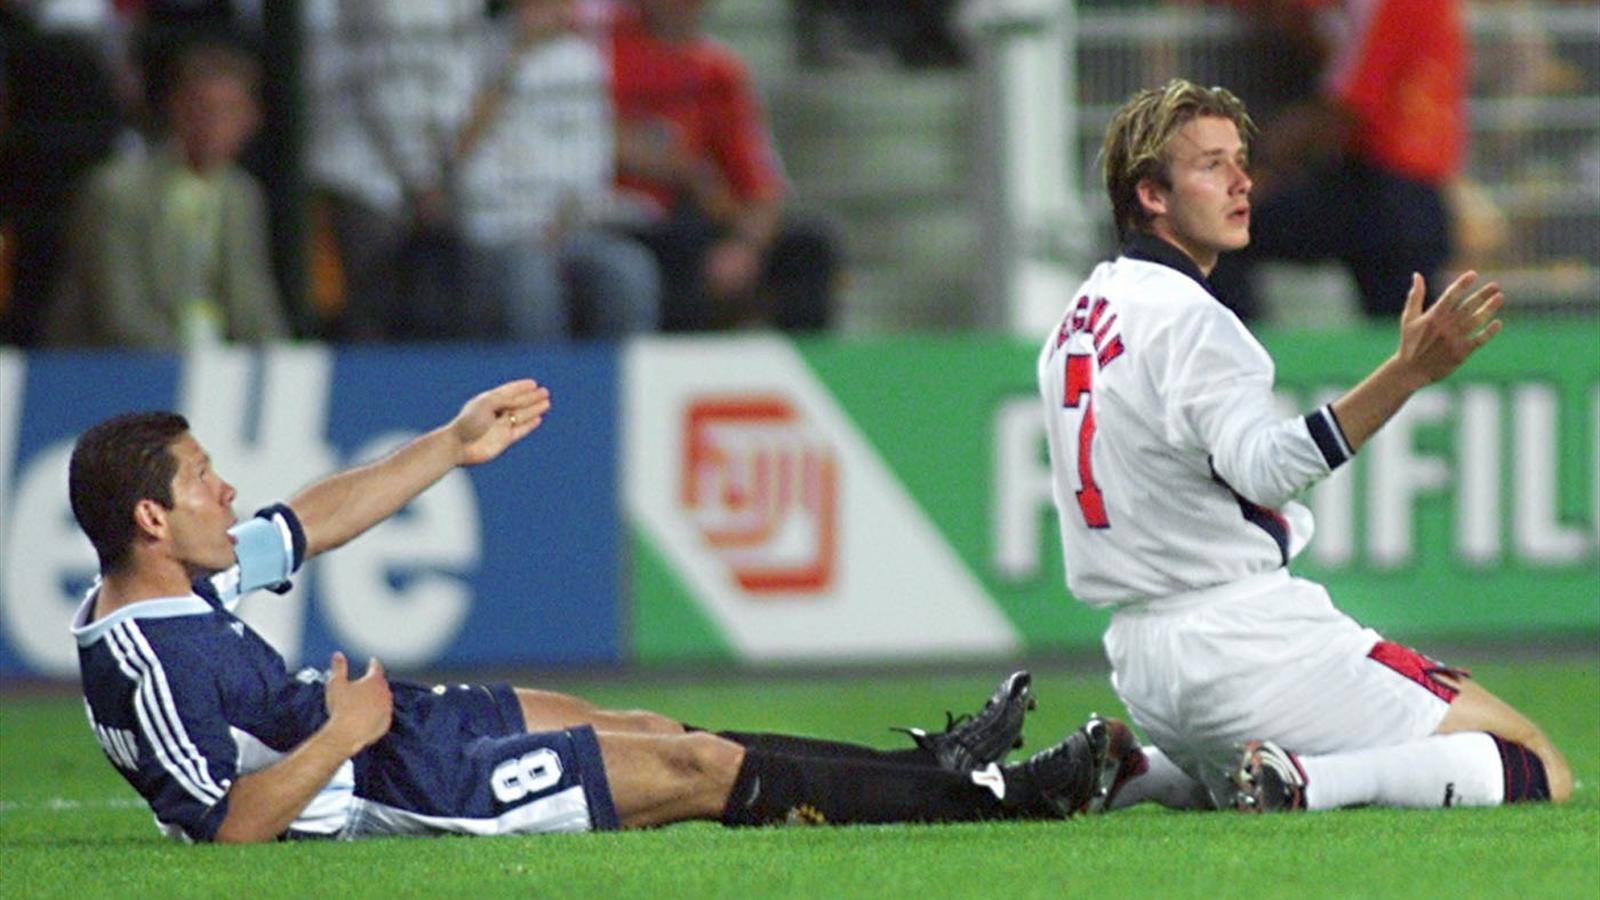 David Beckham and Diego Simeone